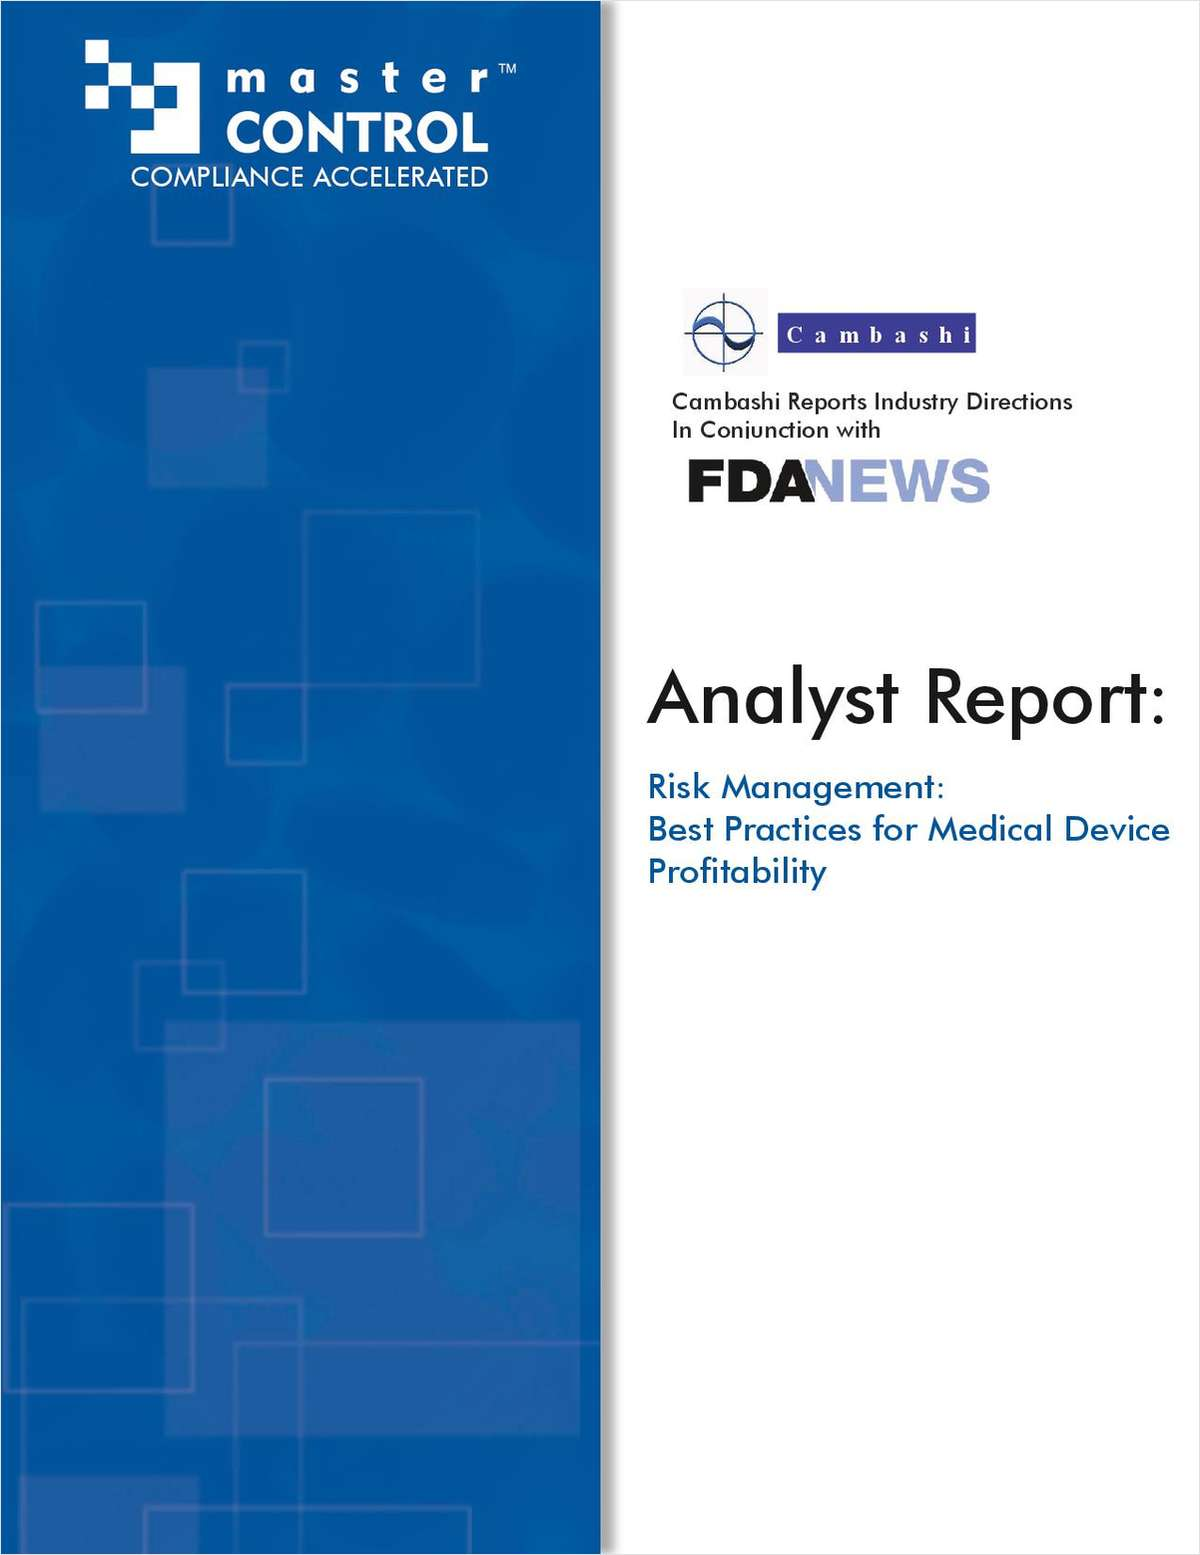 Risk Management: Best Practices for Medical Device Profitability